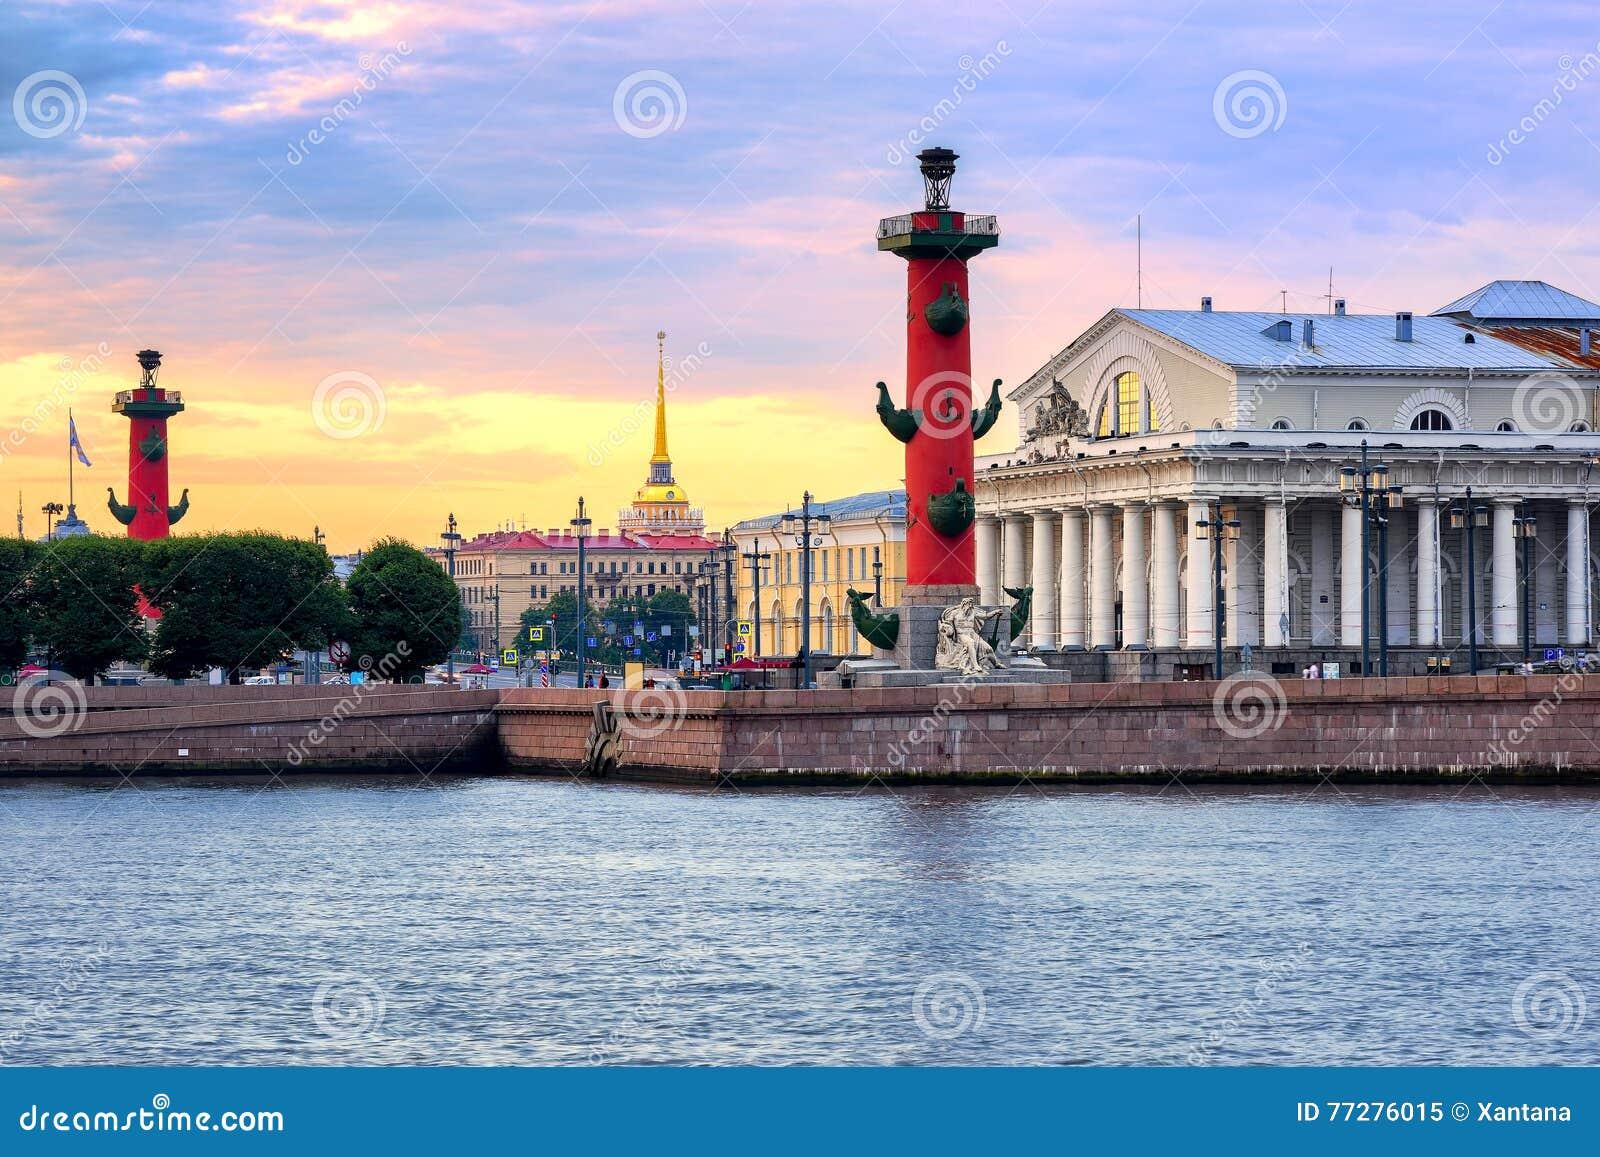 Cityscape van St. Petersburg, Rusland, op zonsondergang